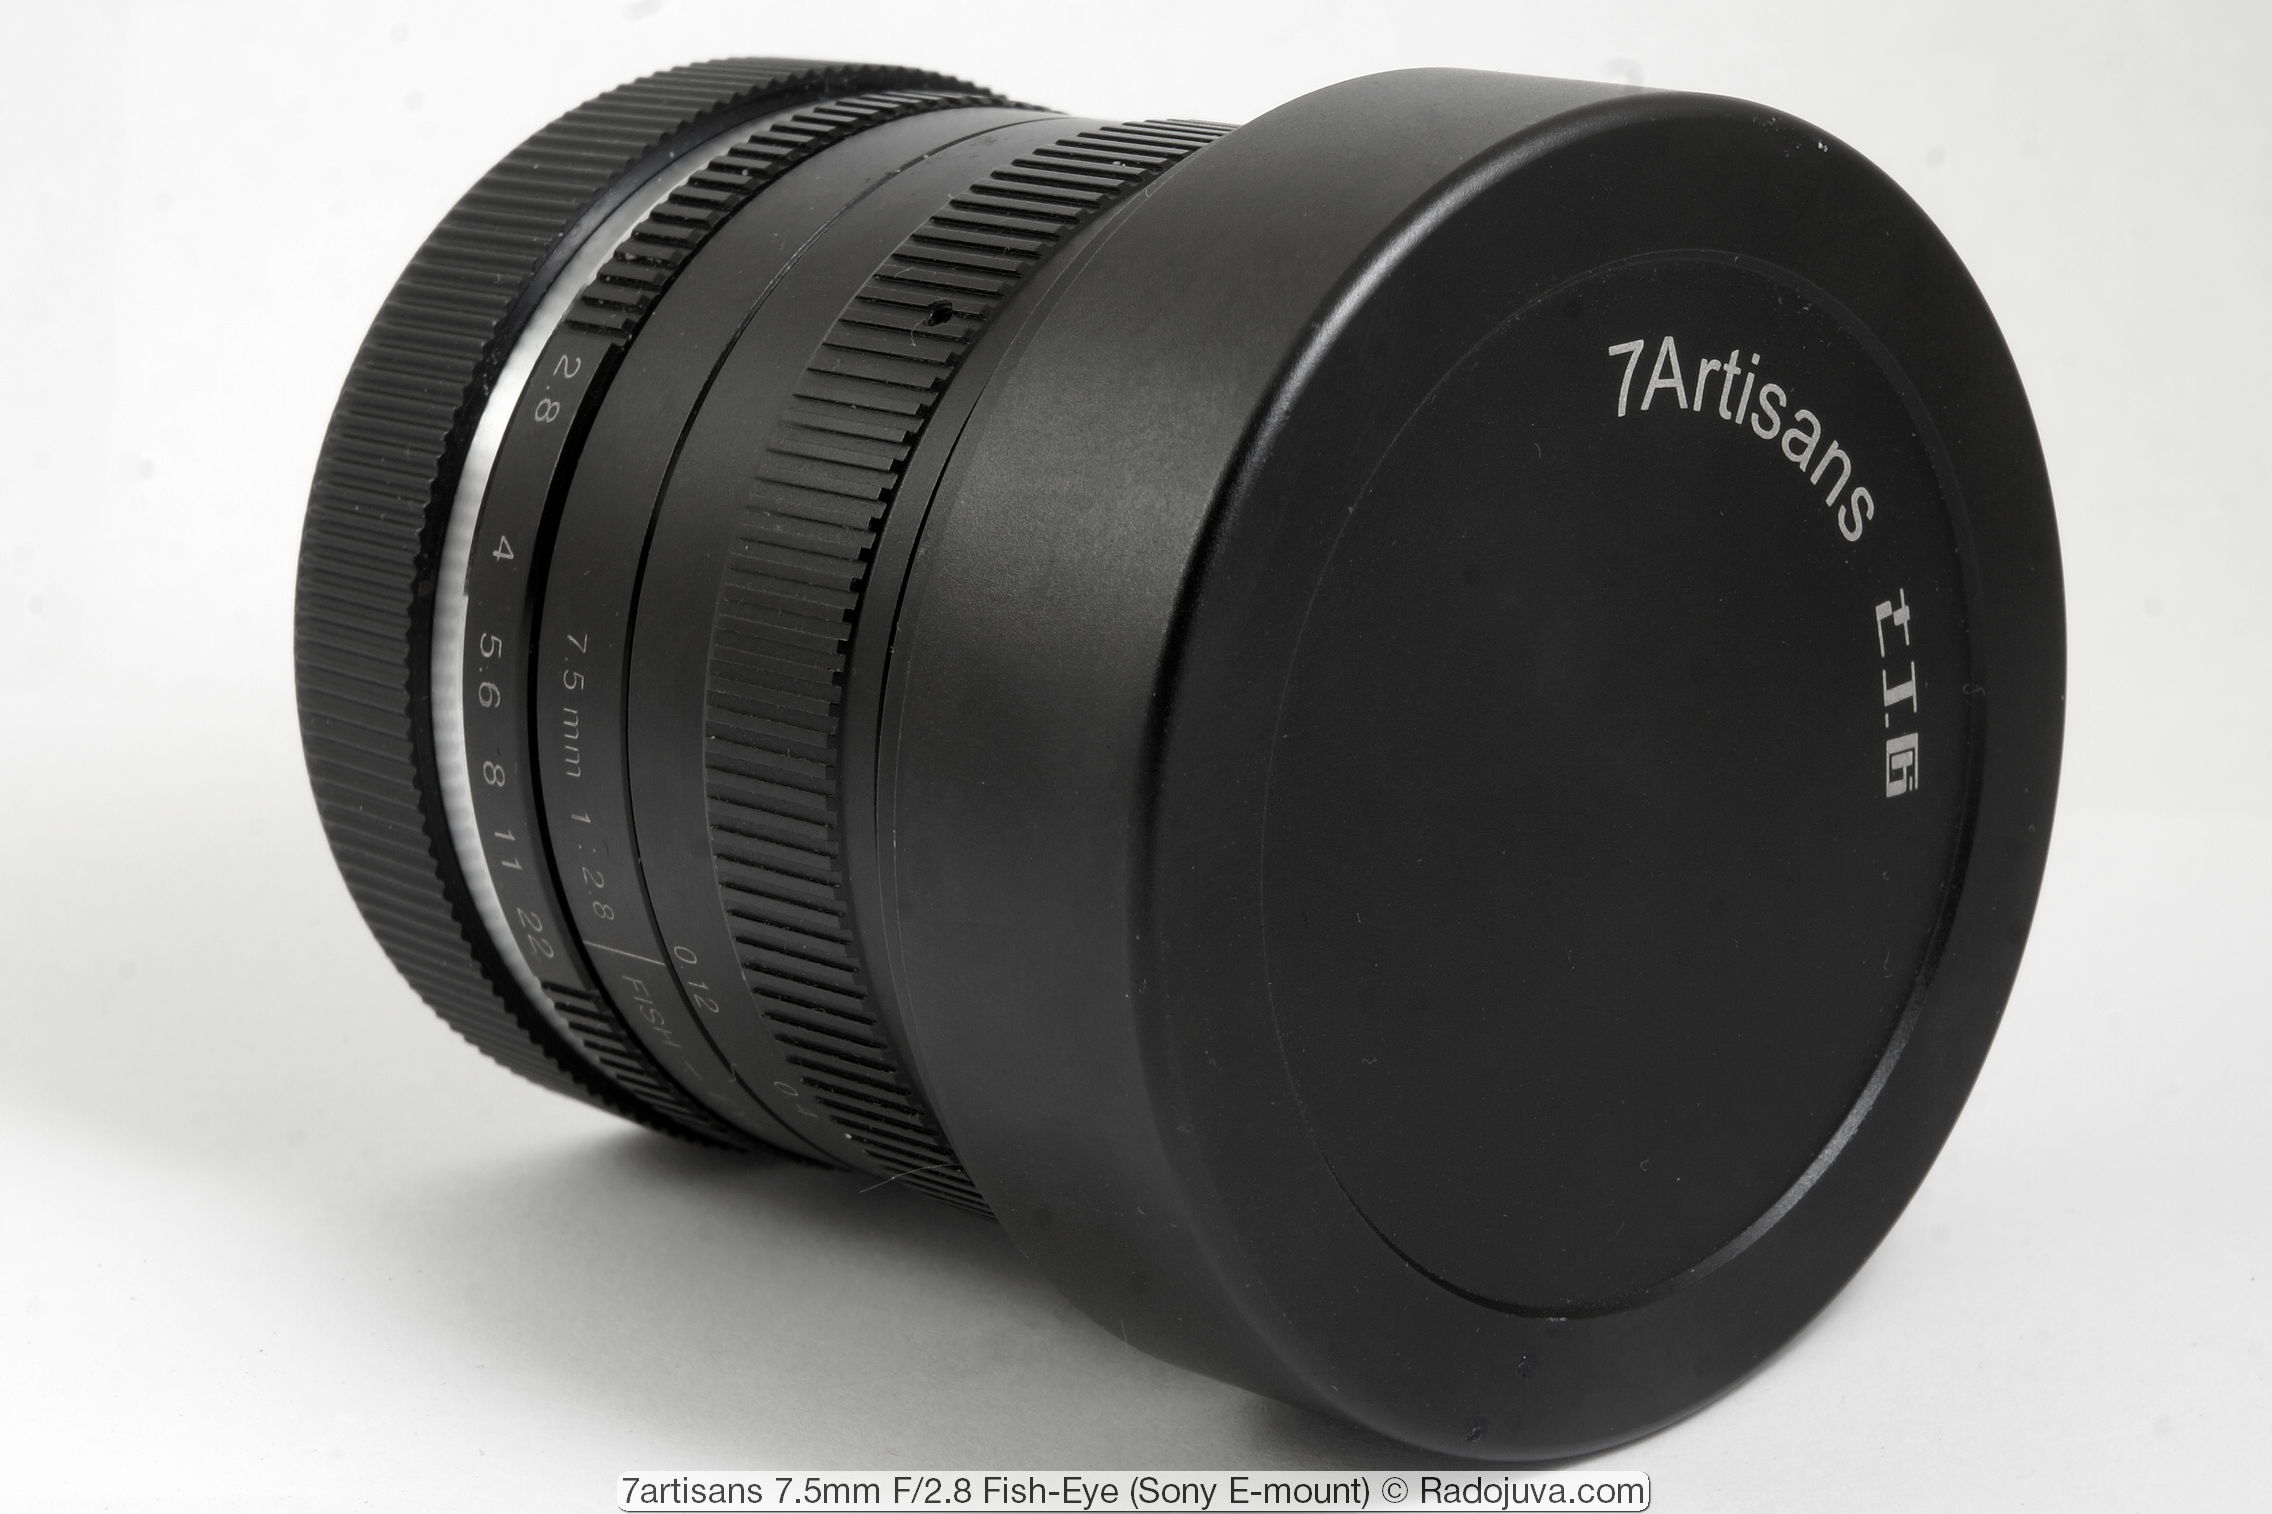 7artisans 7.5mm F/2.8 Fish-Eye